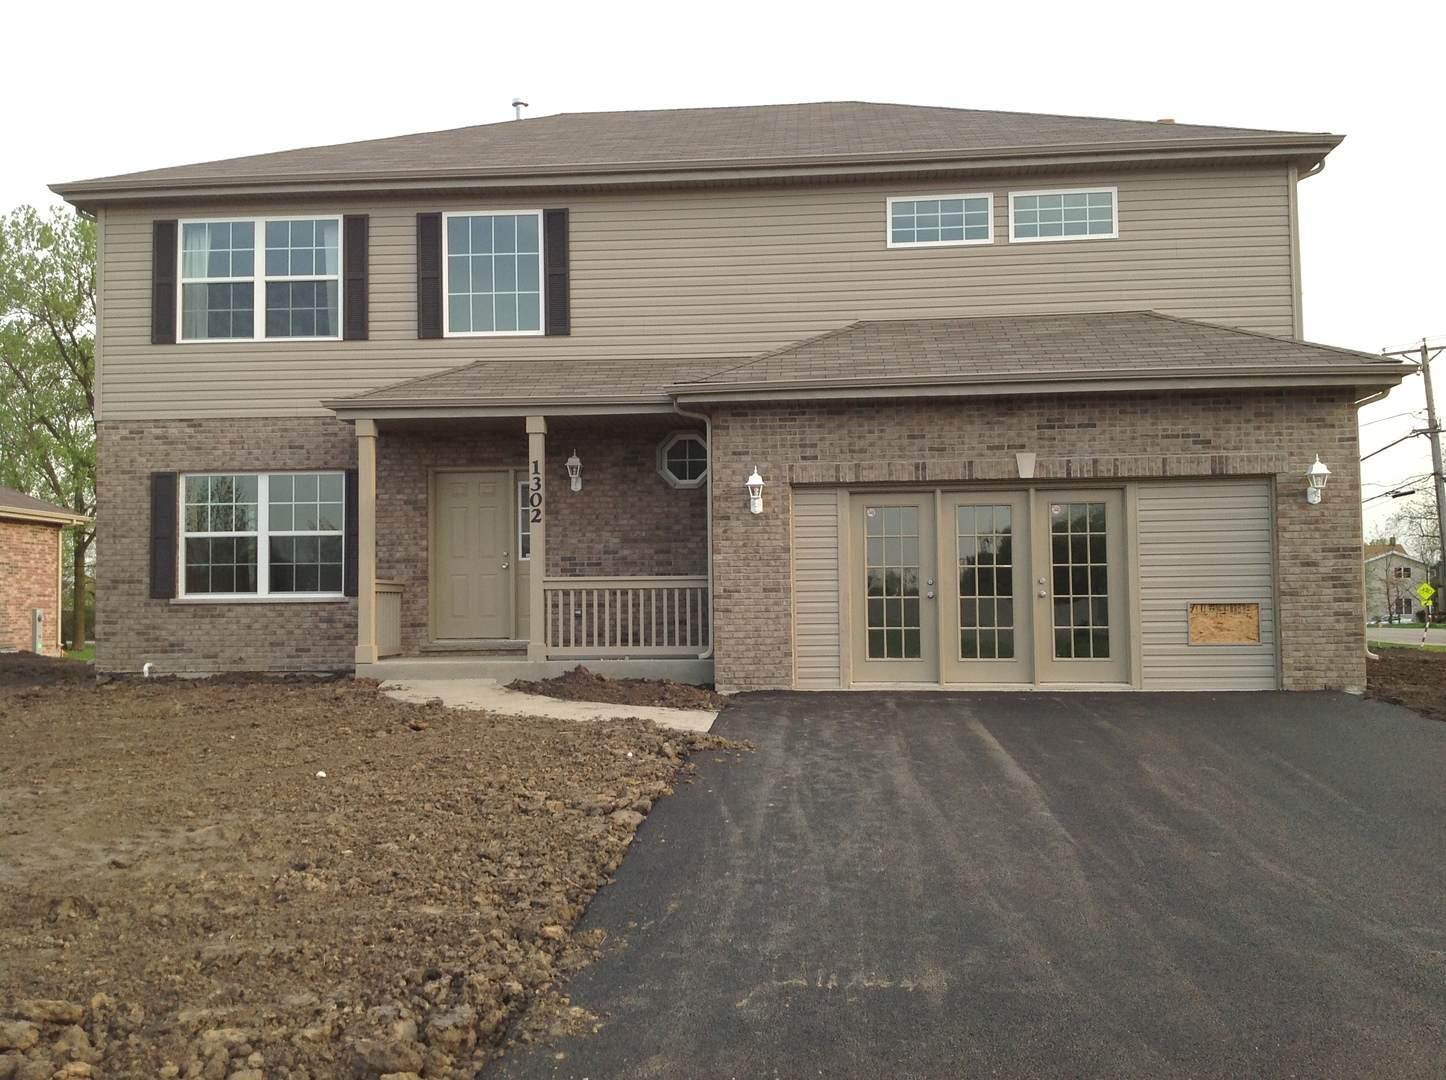 LOT 20 Shamrock Lane, Manteno, IL 60950 (MLS #10911893) :: Angela Walker Homes Real Estate Group